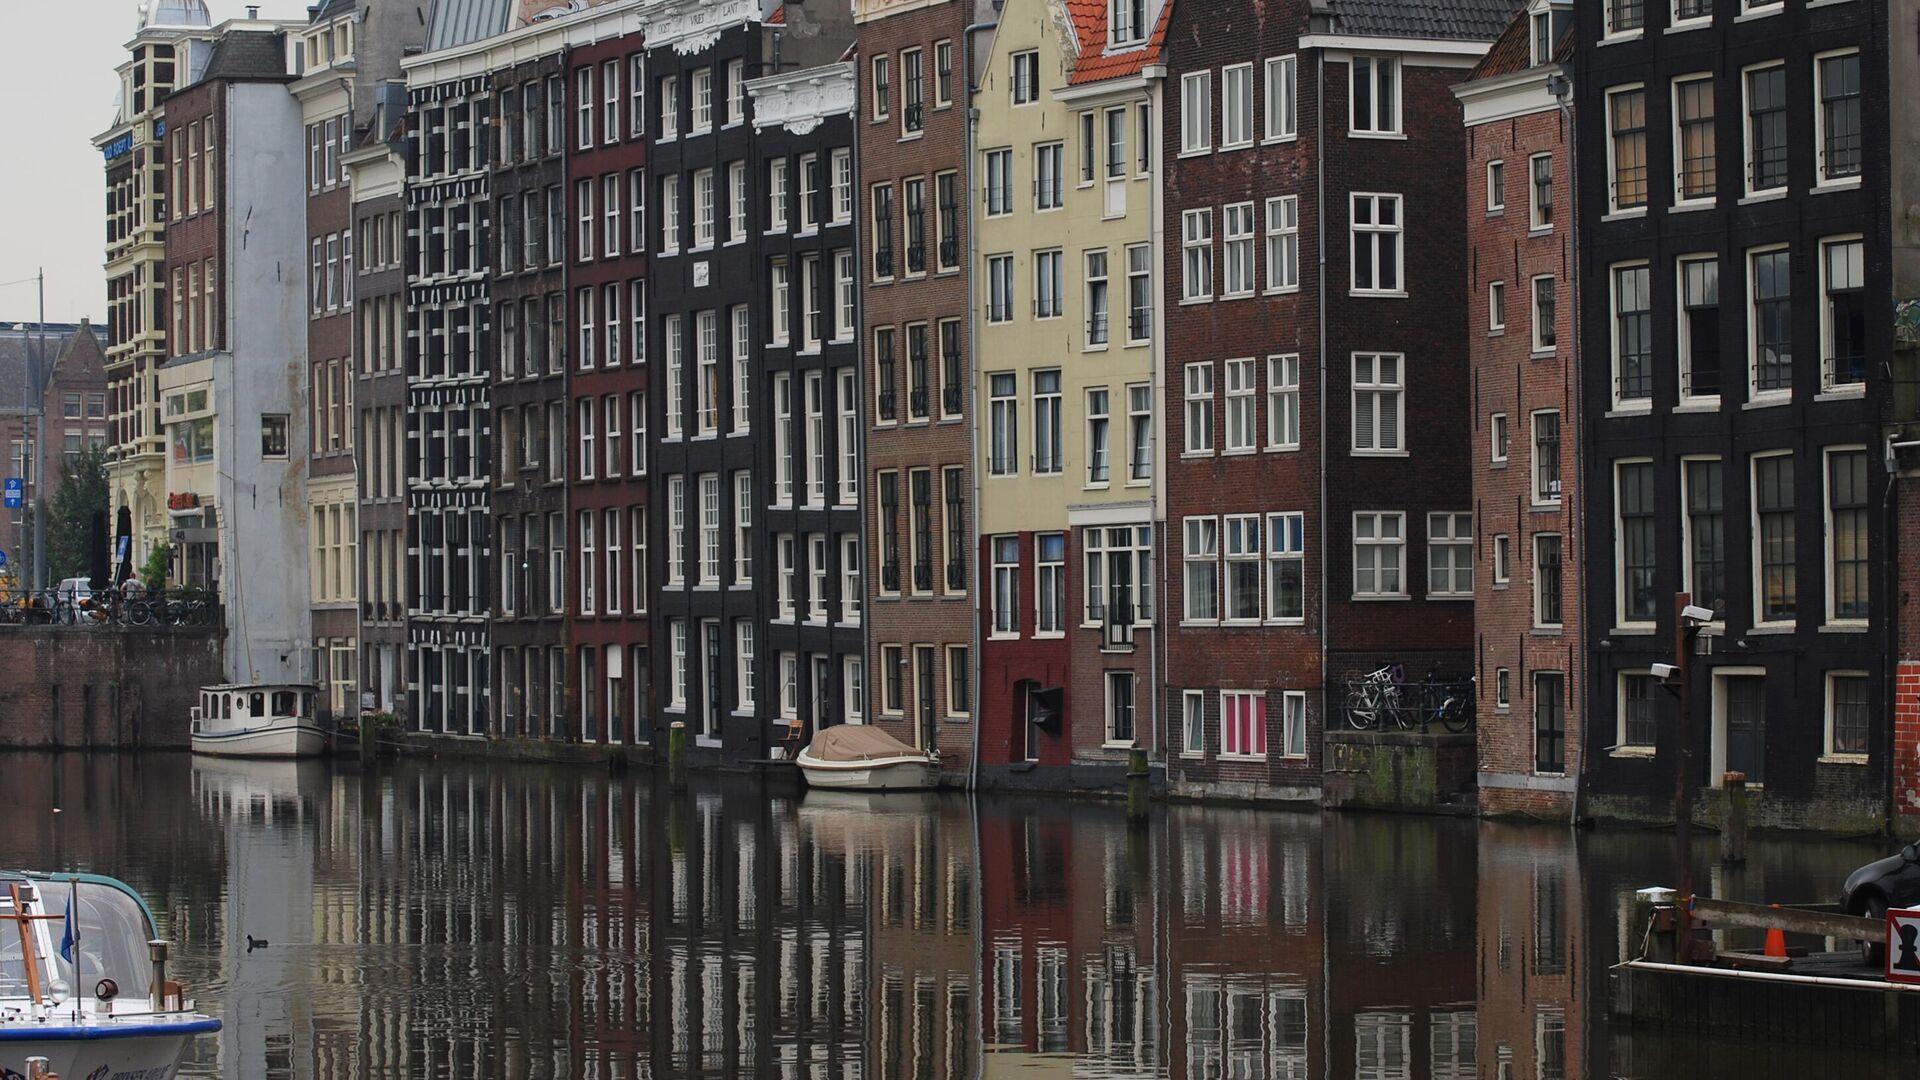 Ámsterdam (Países Bajos) - Sputnik Mundo, 1920, 11.02.2021